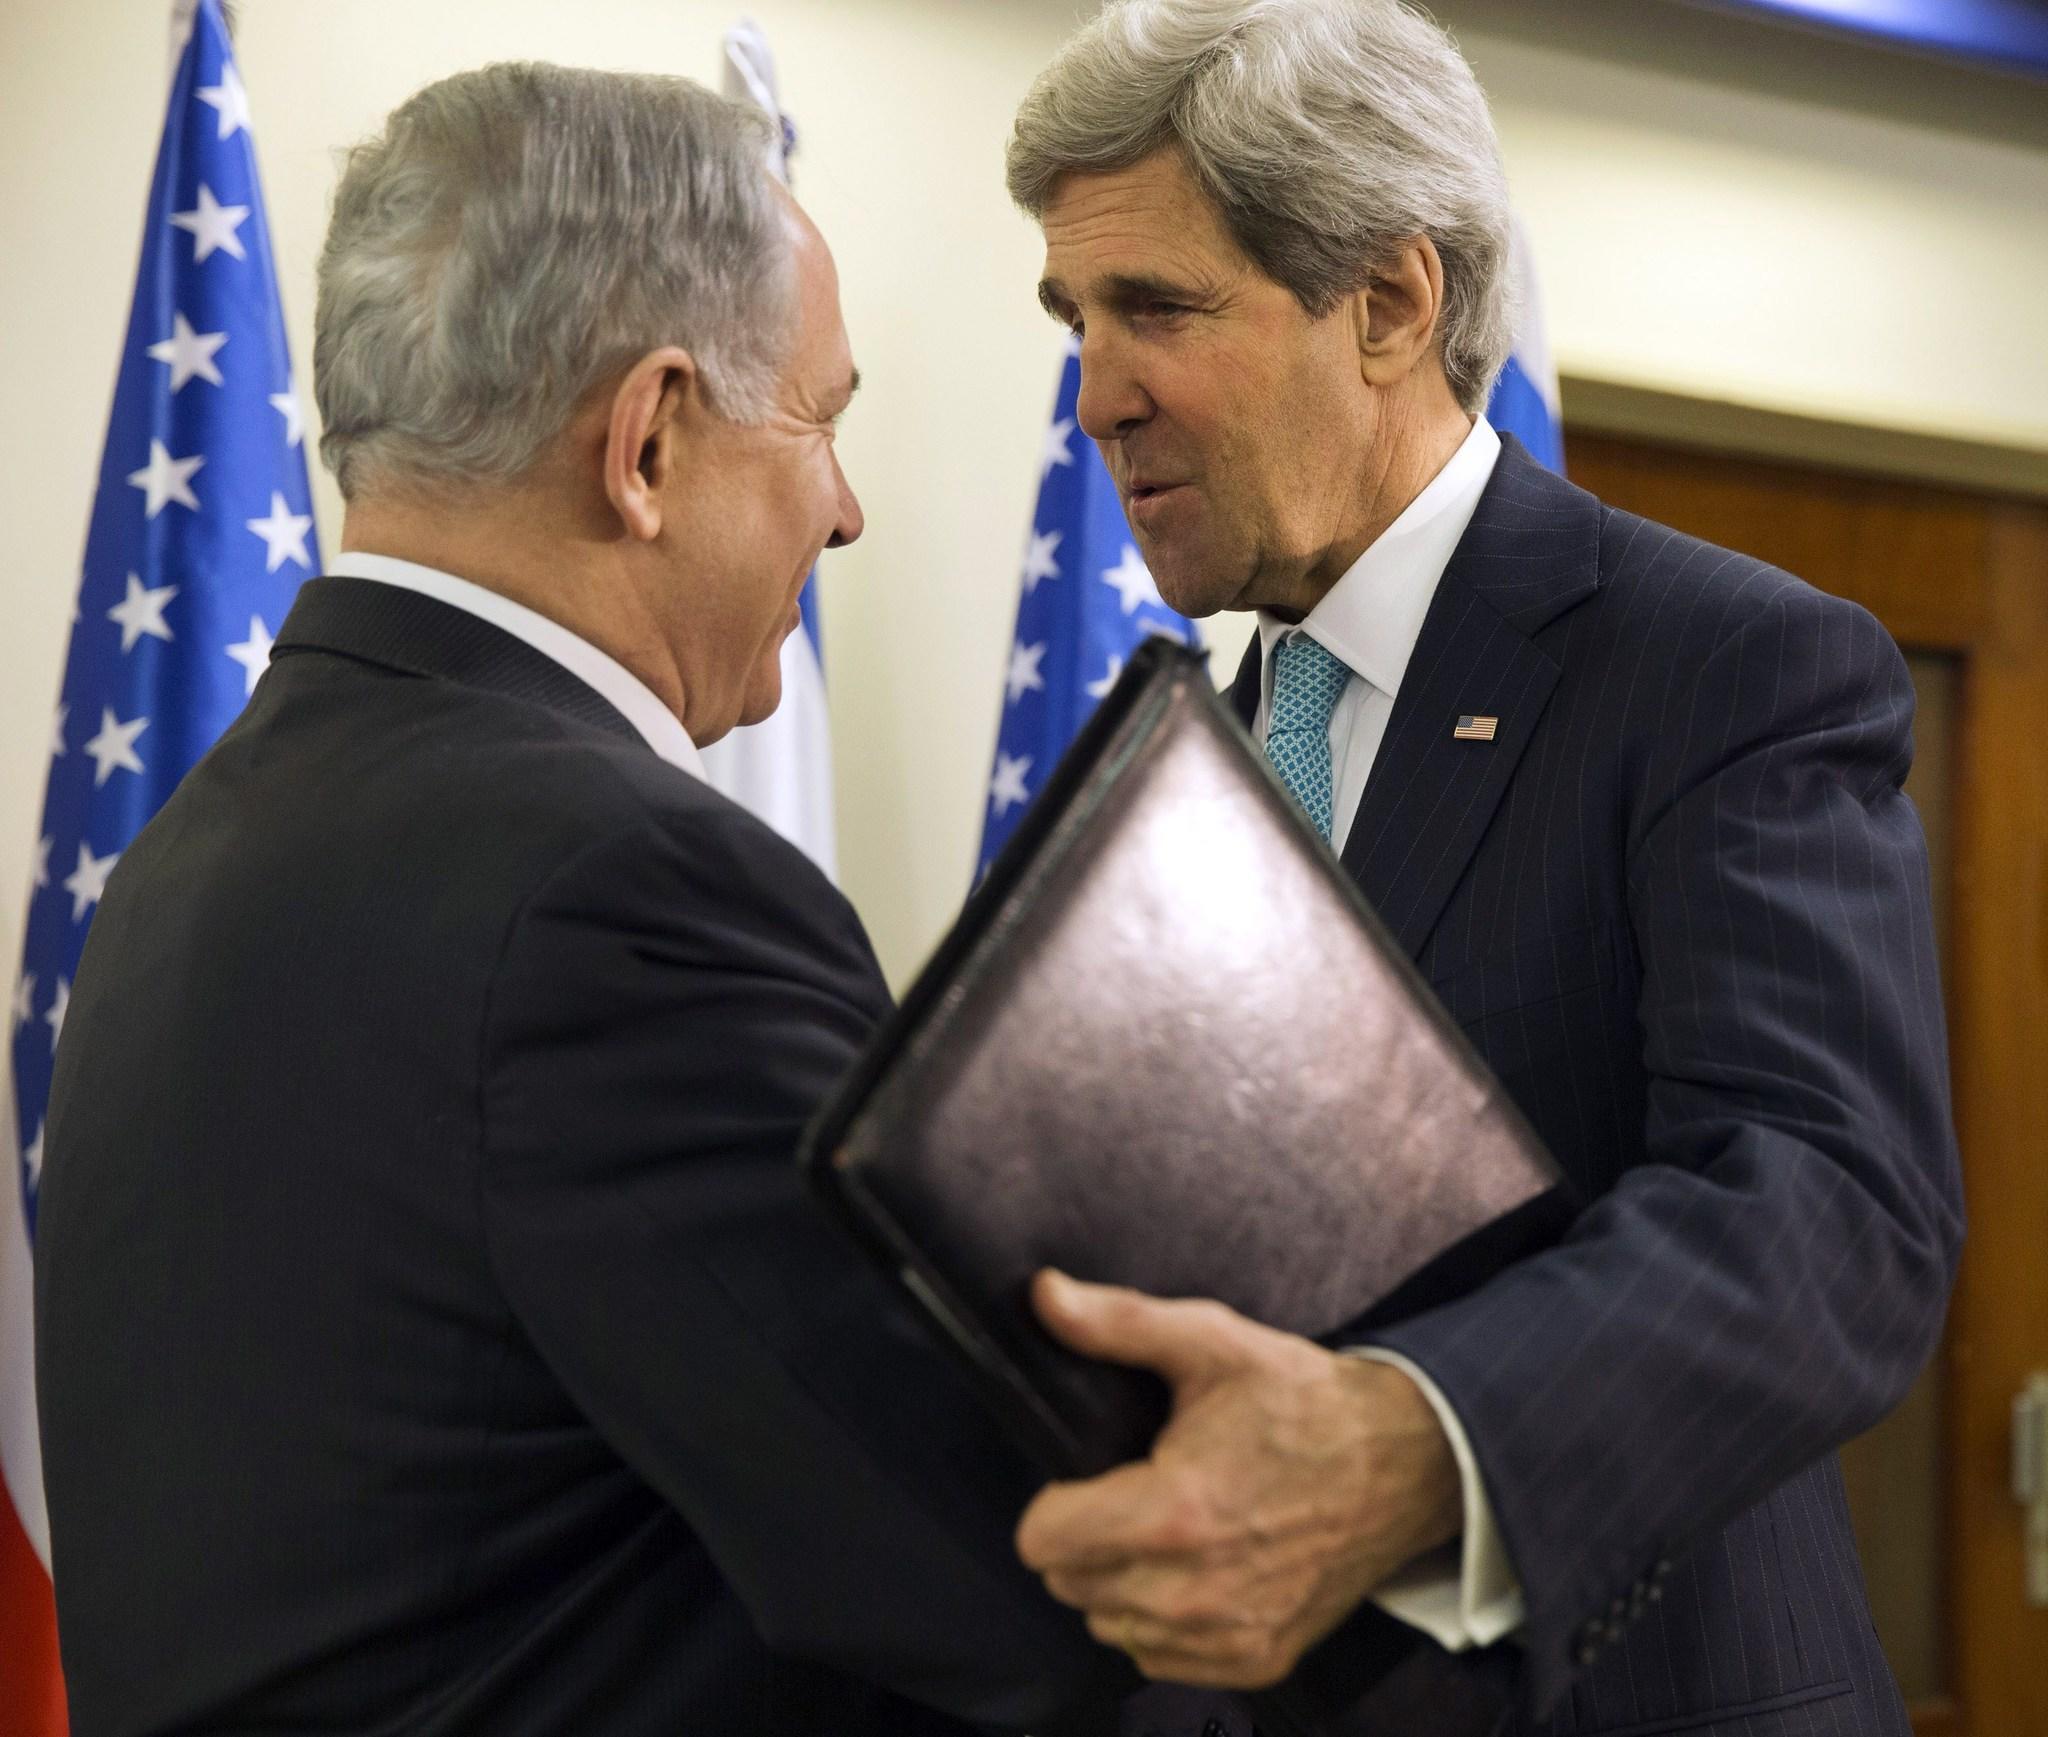 Israeli Prime Minister Benjamin Netanyahu welcomes US Secretary of State John Kerry (R) in Jerusalem March 31, 2014.